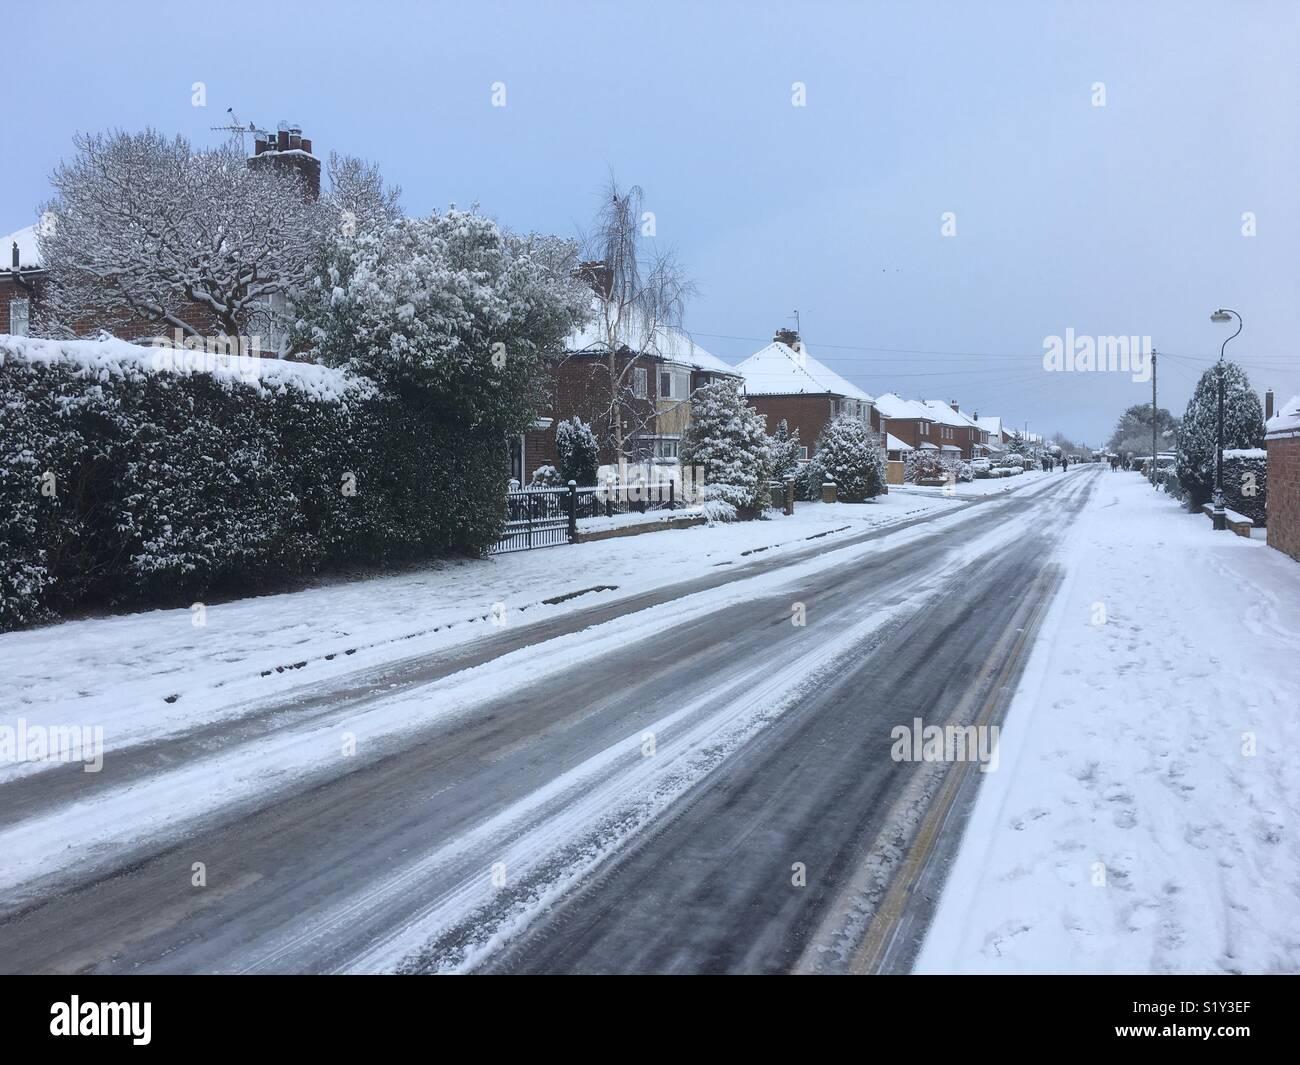 Snow on Racecourse Lane, Northallerton, England, UK. 27 February 2018 Stock Photo